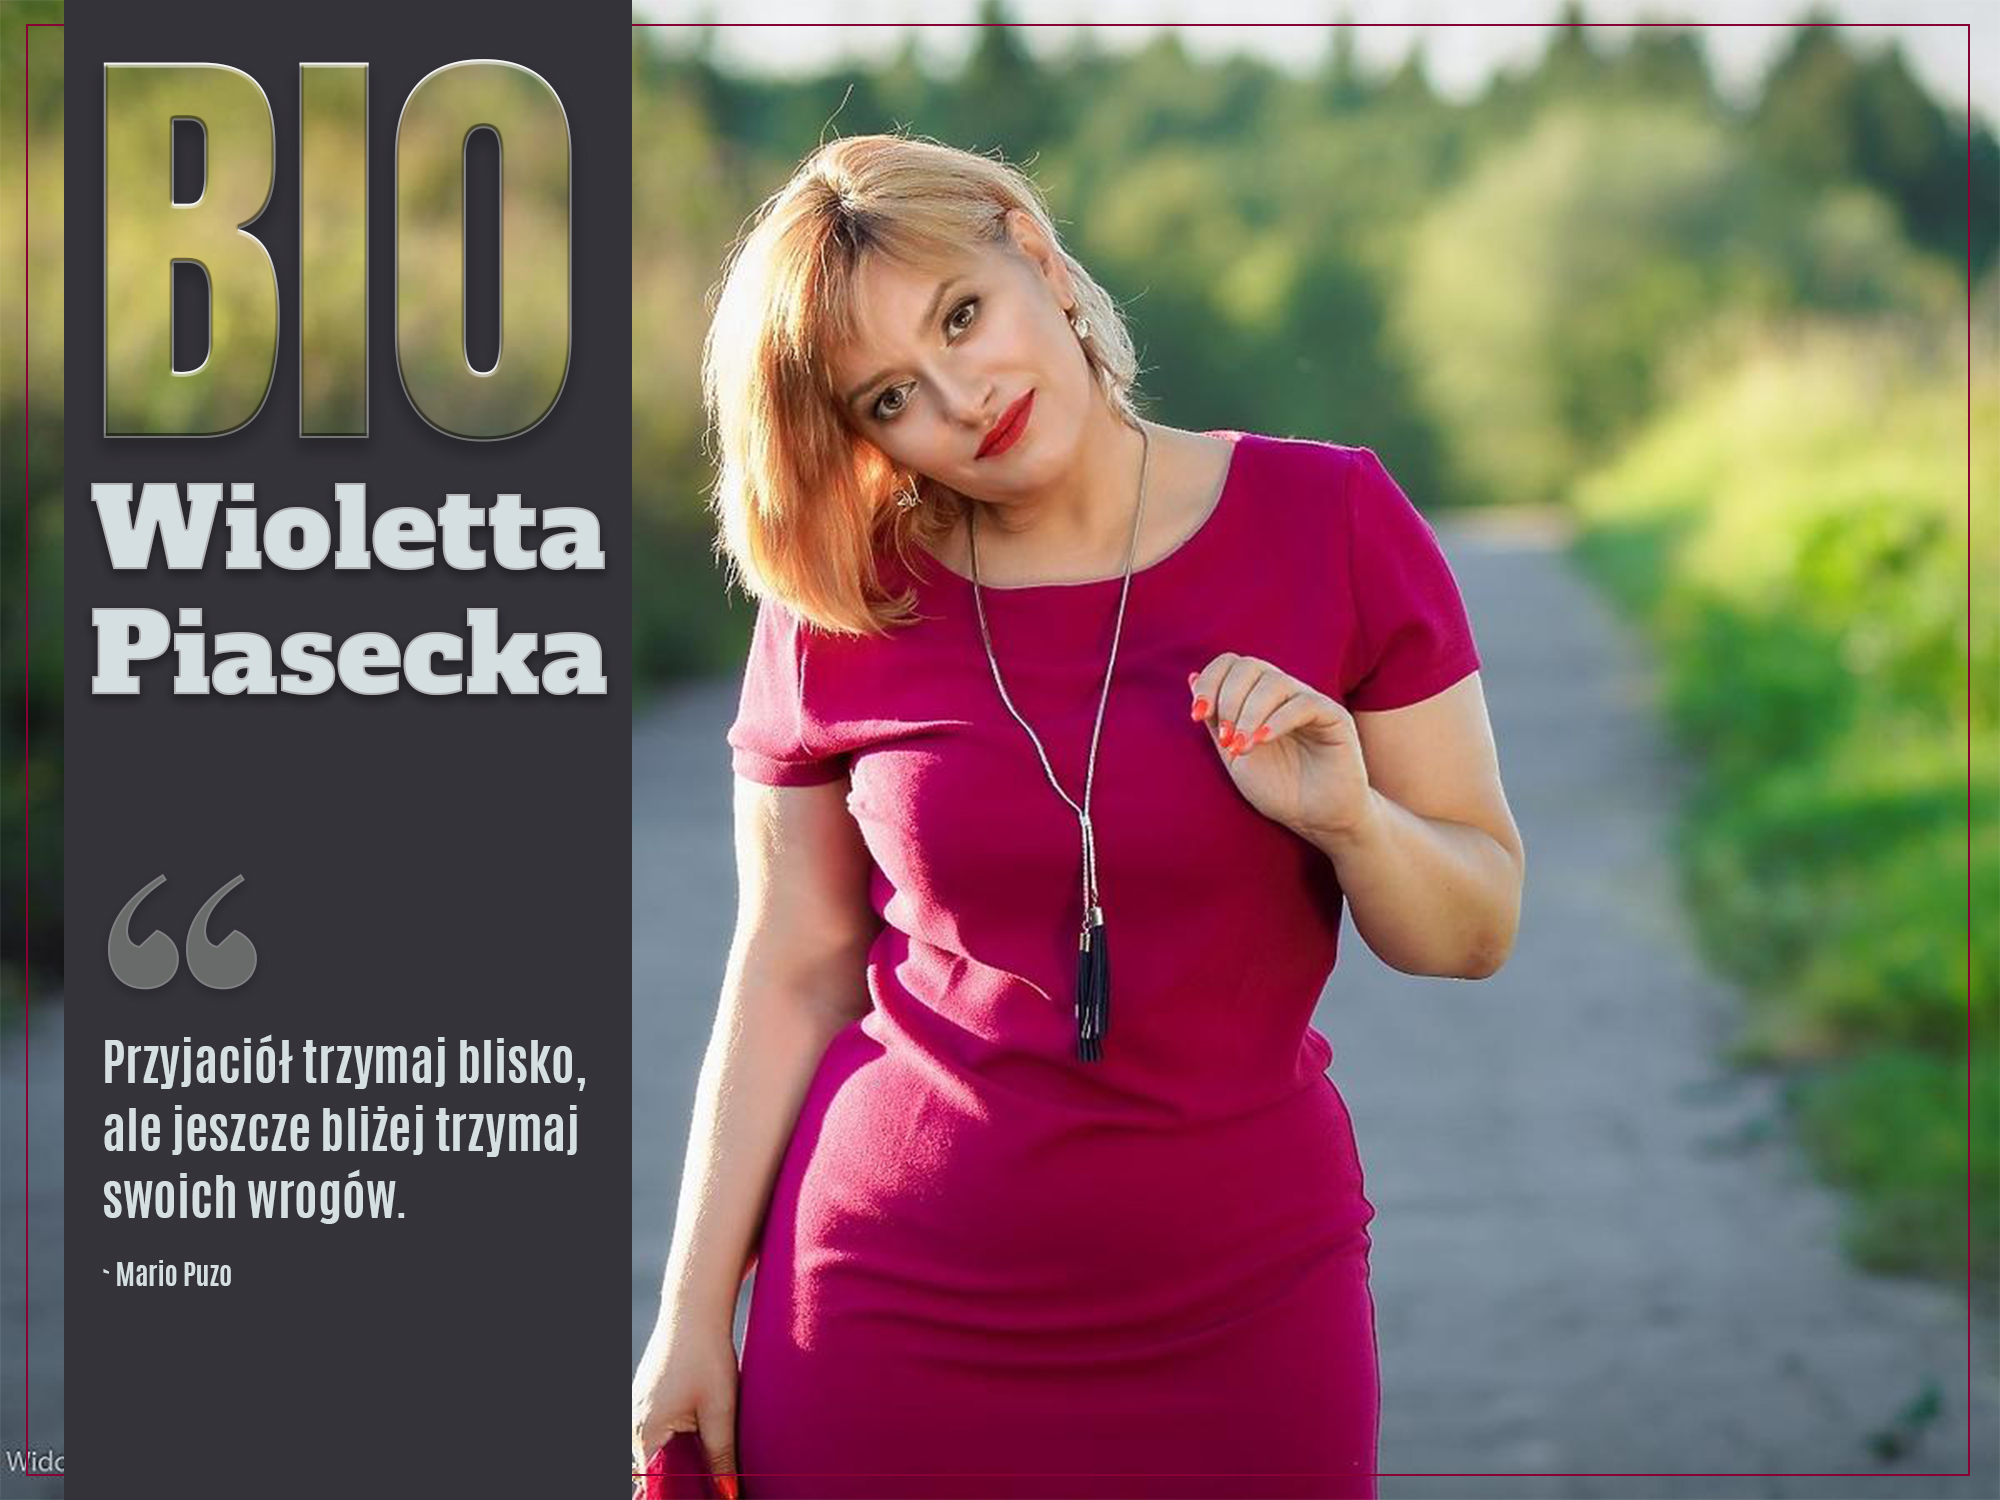 Wioletta Piasecka.BIOfot. Adam Widowski